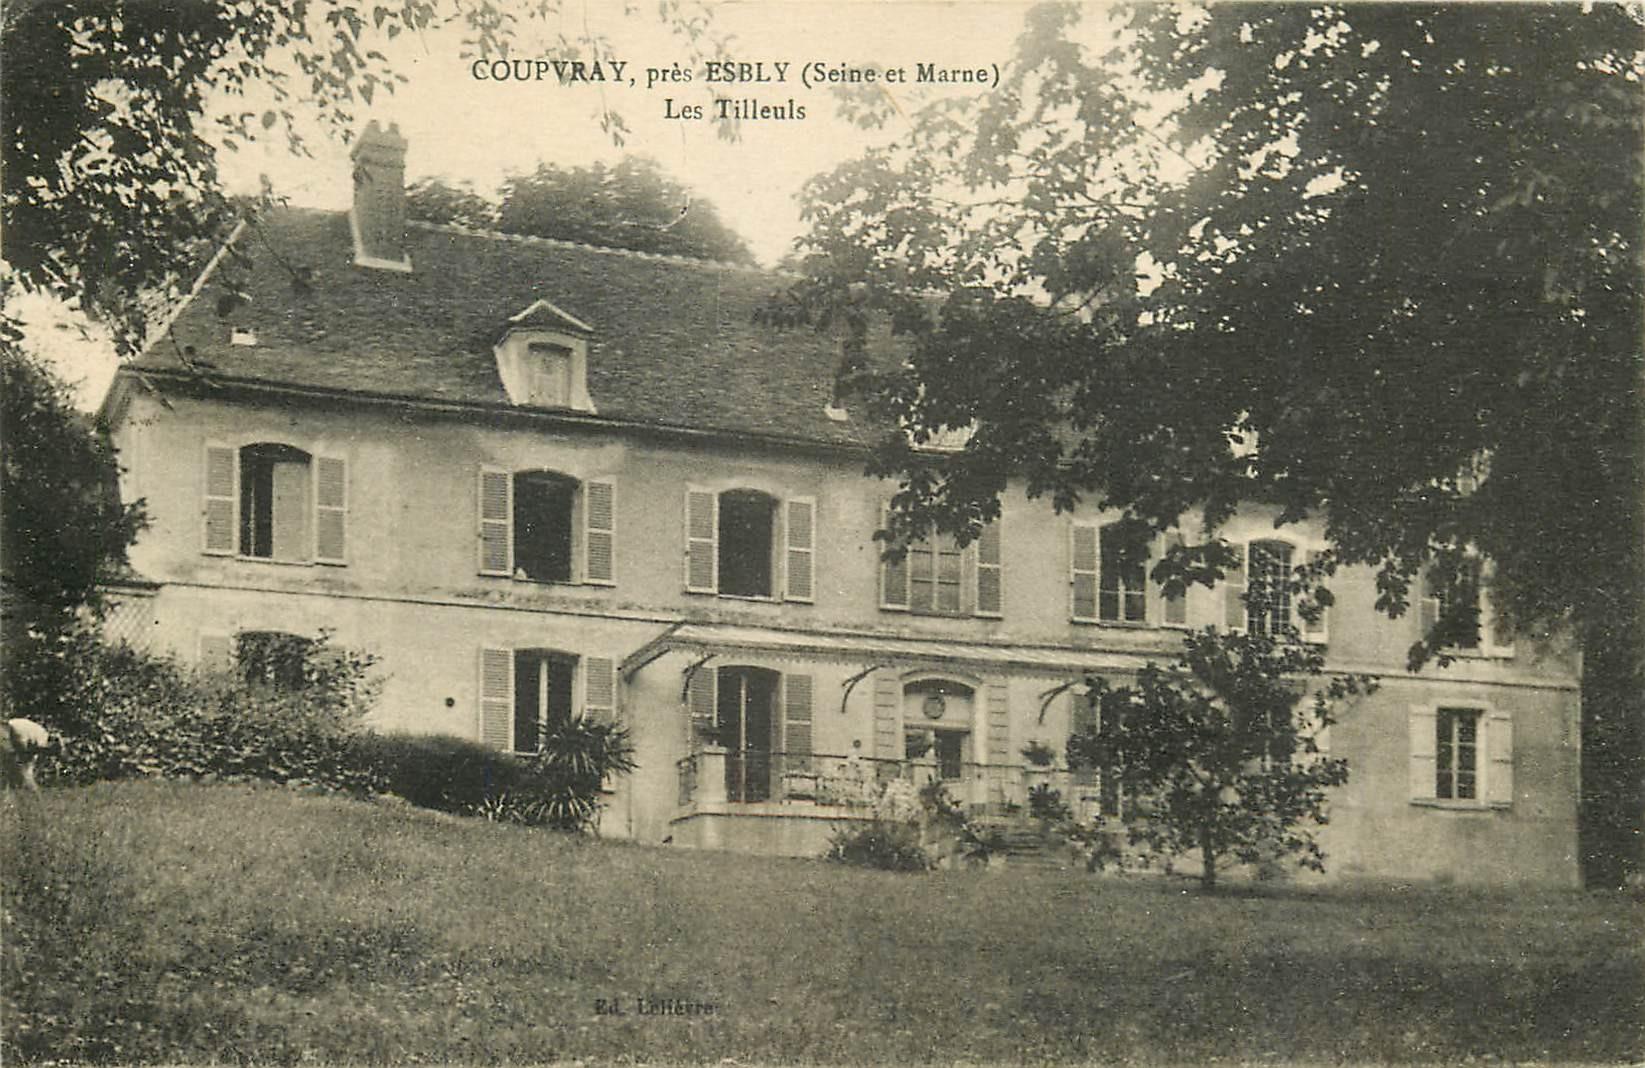 77 COUPVRAY. Les Tilleuls 1923